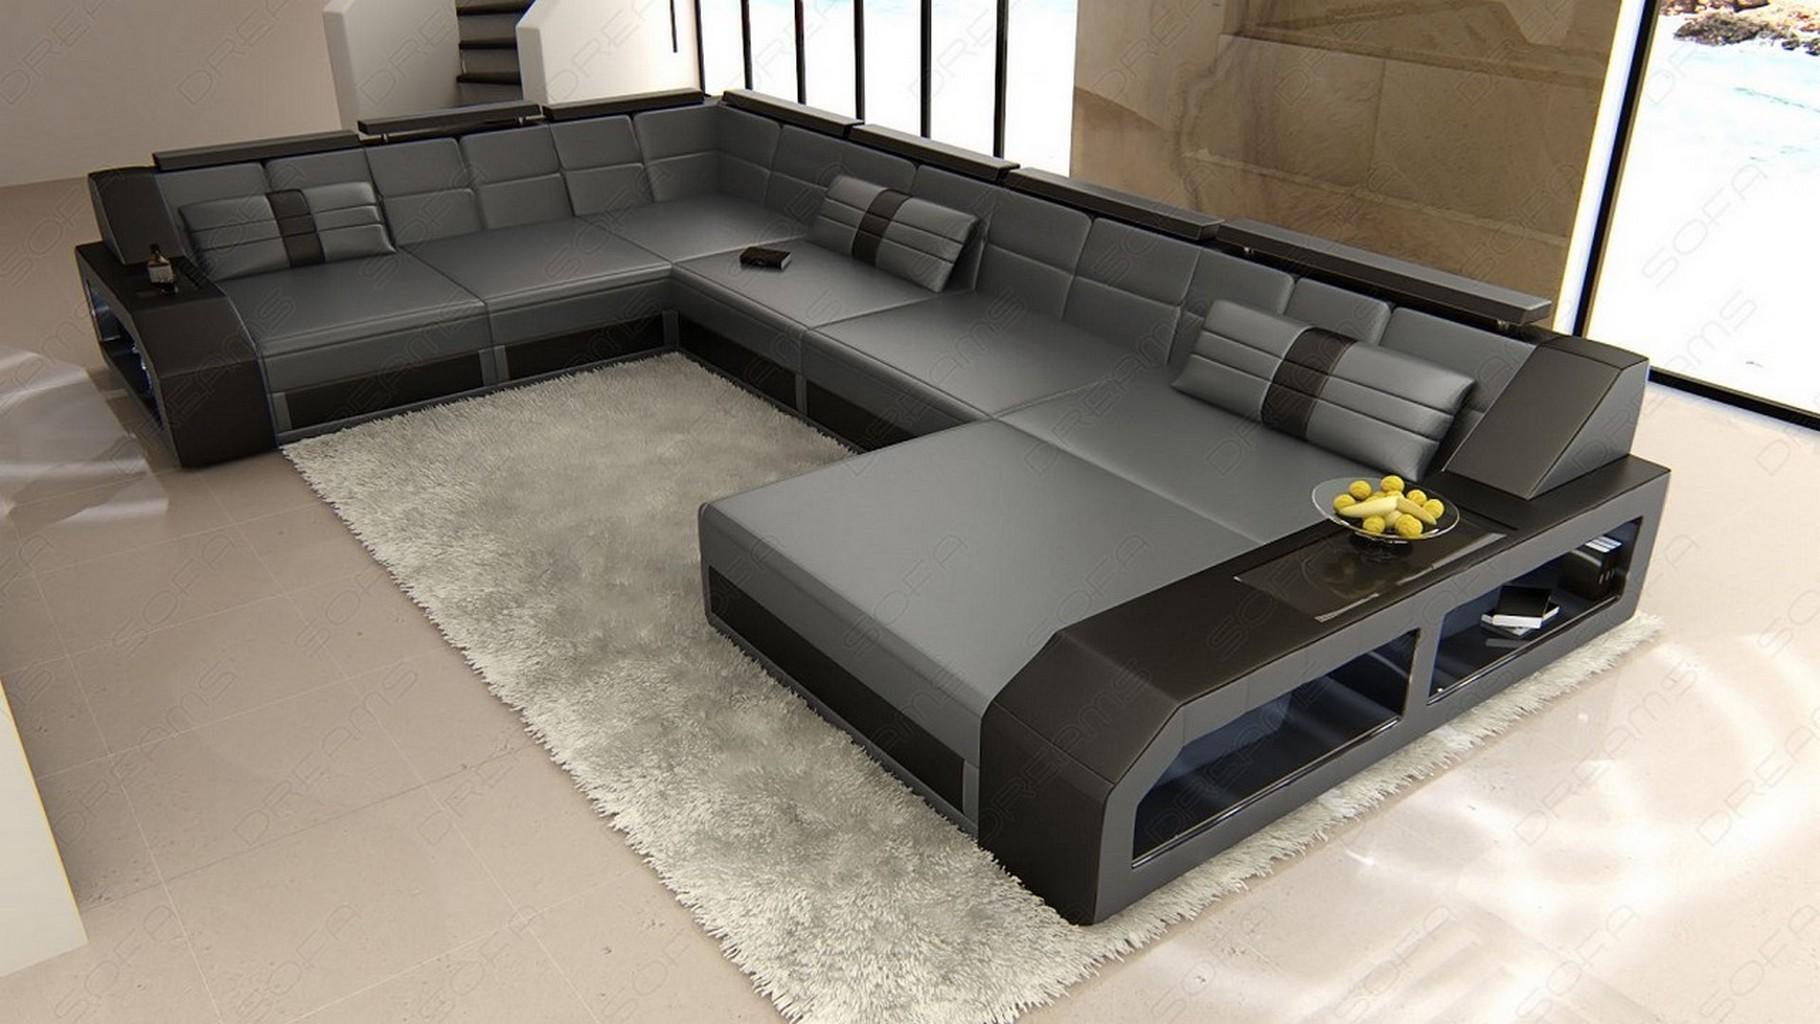 design sectional sofa matera xxl with led lights grey black ebay. Black Bedroom Furniture Sets. Home Design Ideas